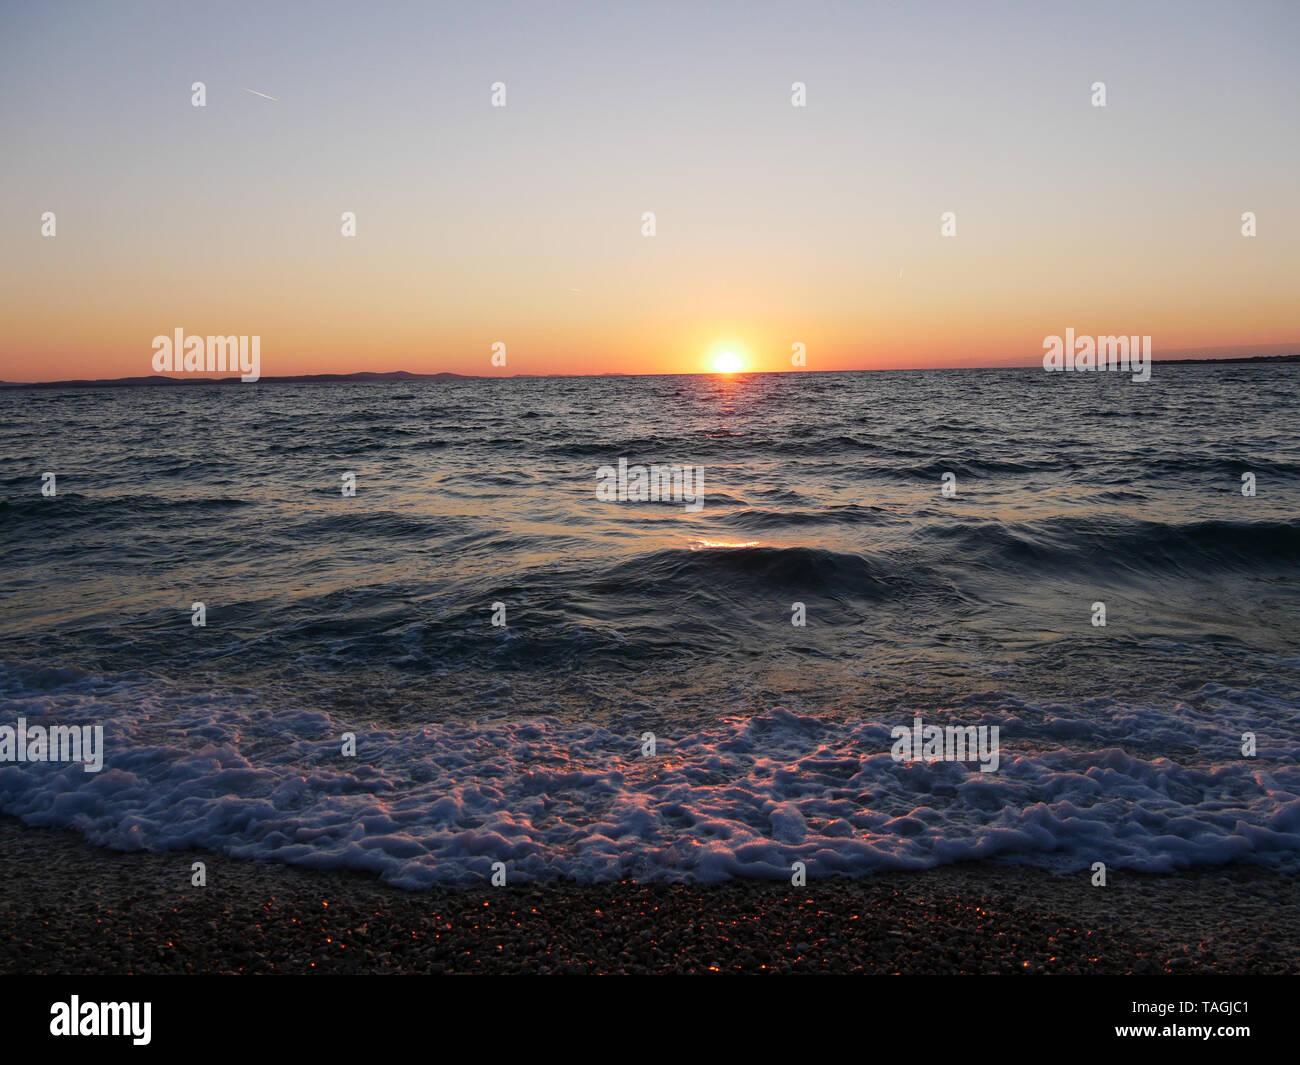 Sunset on the Adriatic coast Stock Photo